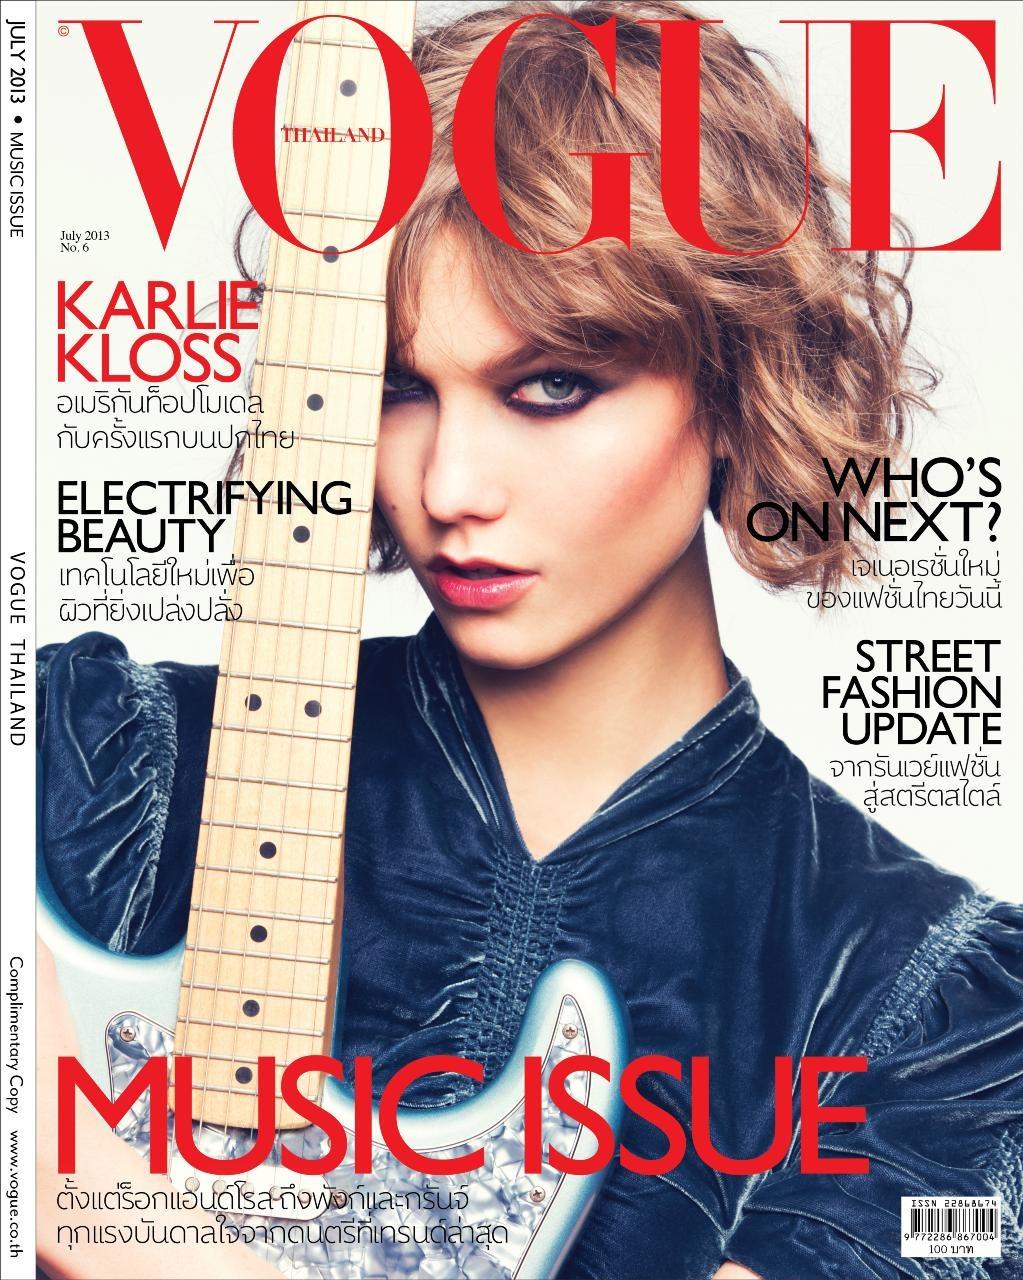 Image: Vogue Thailand